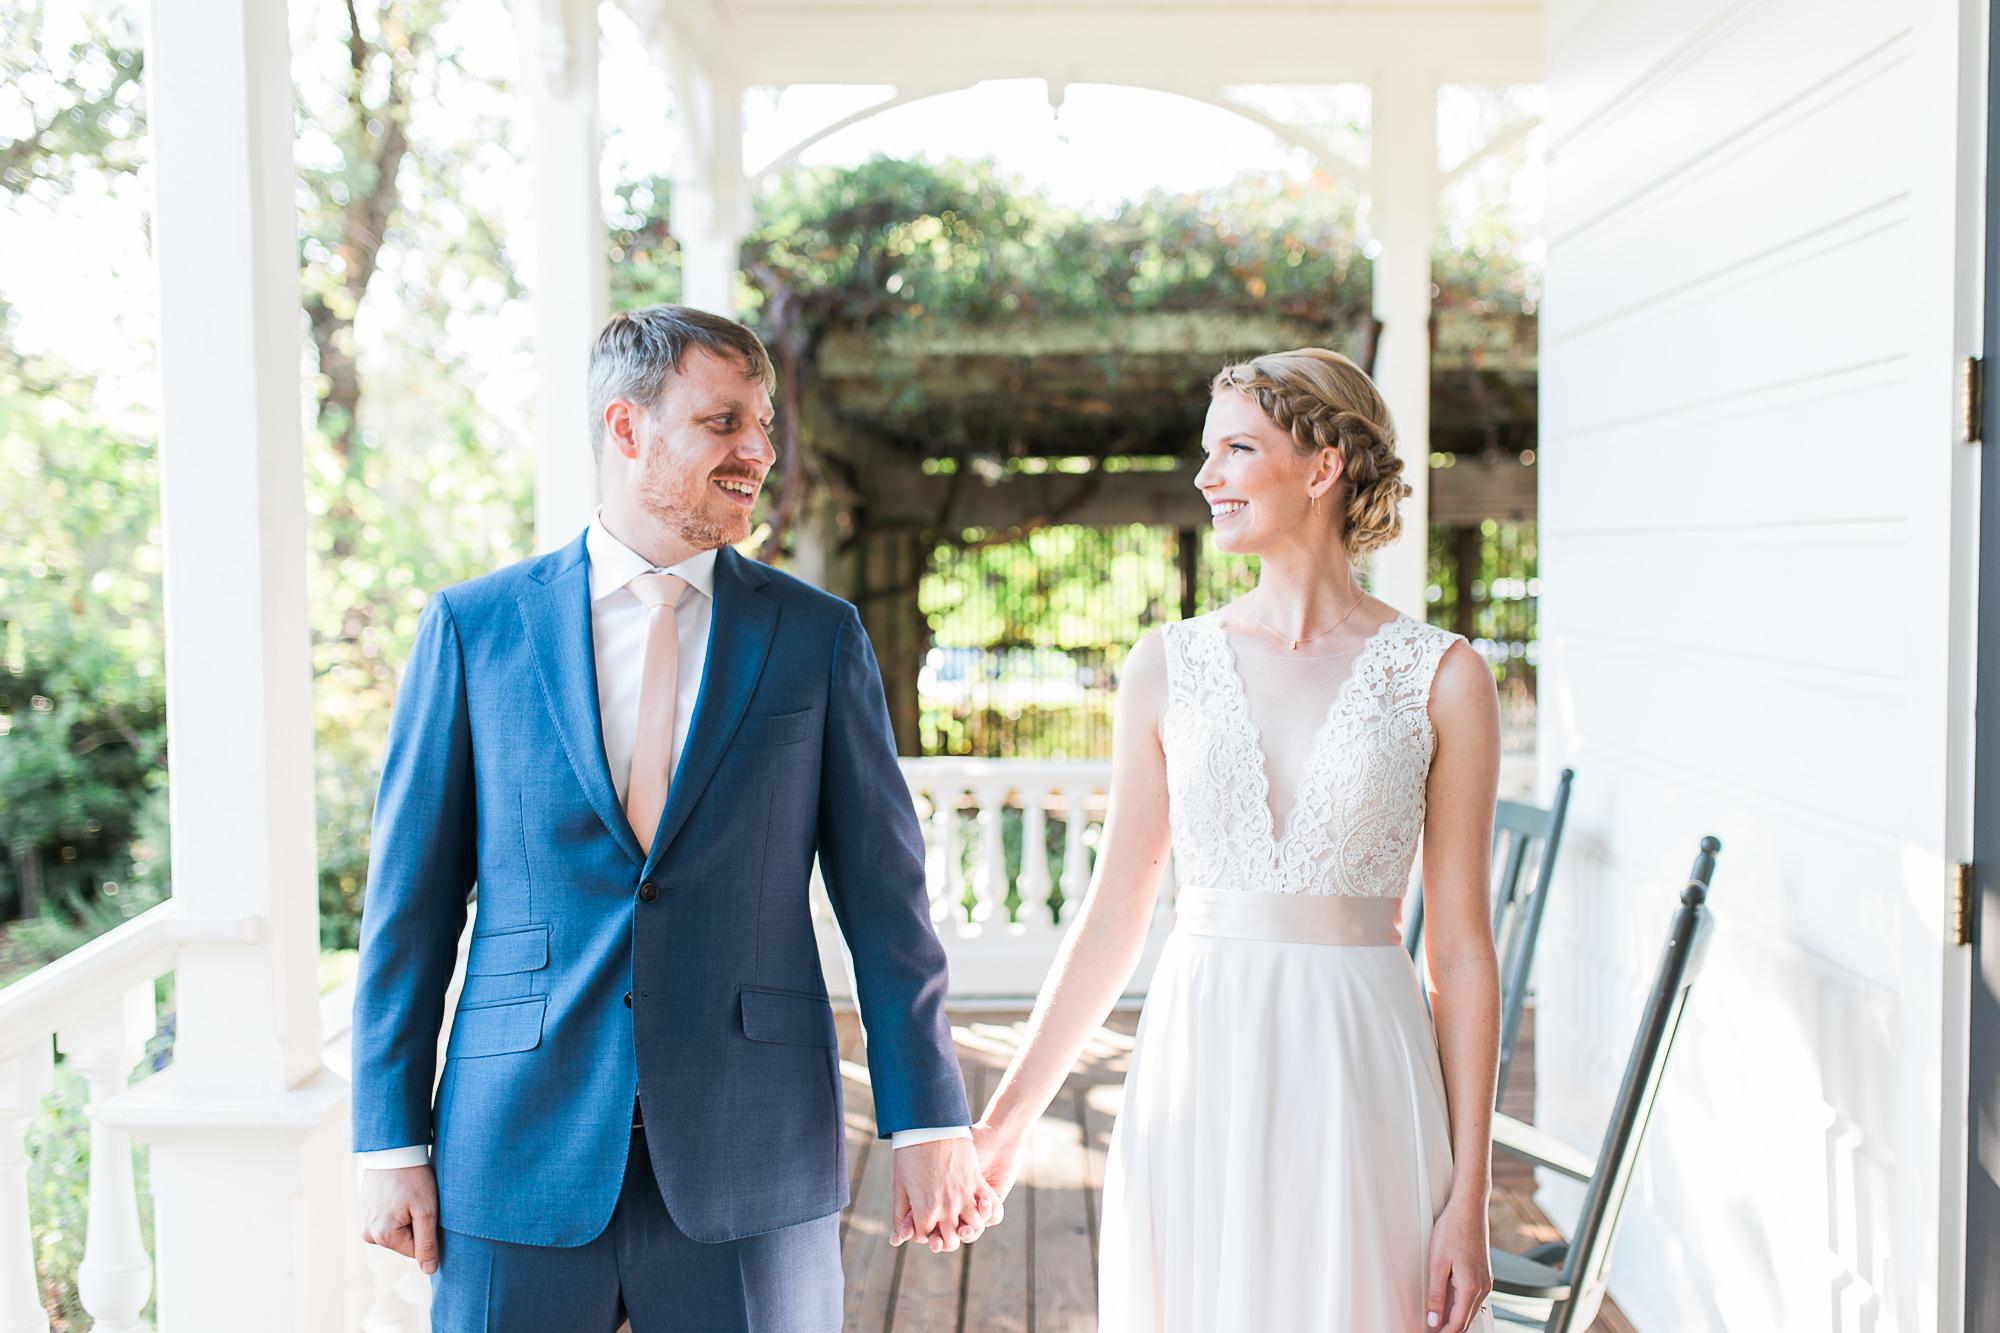 Generals Daughter Wedding Photos by JBJ Pictures - Ramekins Wedding Venue Photographer in Sonoma, Napa (8).jpg